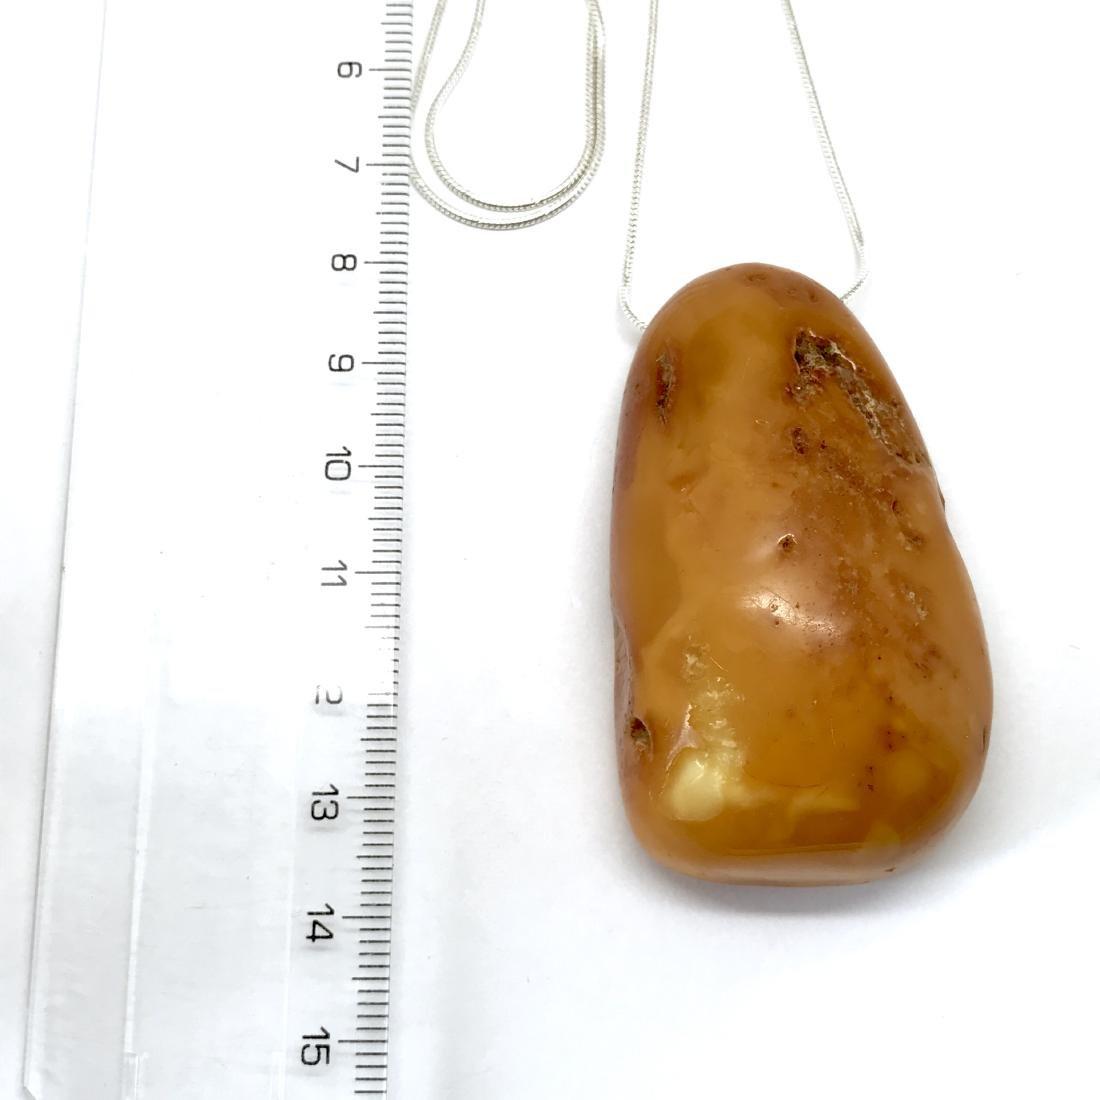 Antique Baltic amber pendant amulet 57x32x20mm - 2